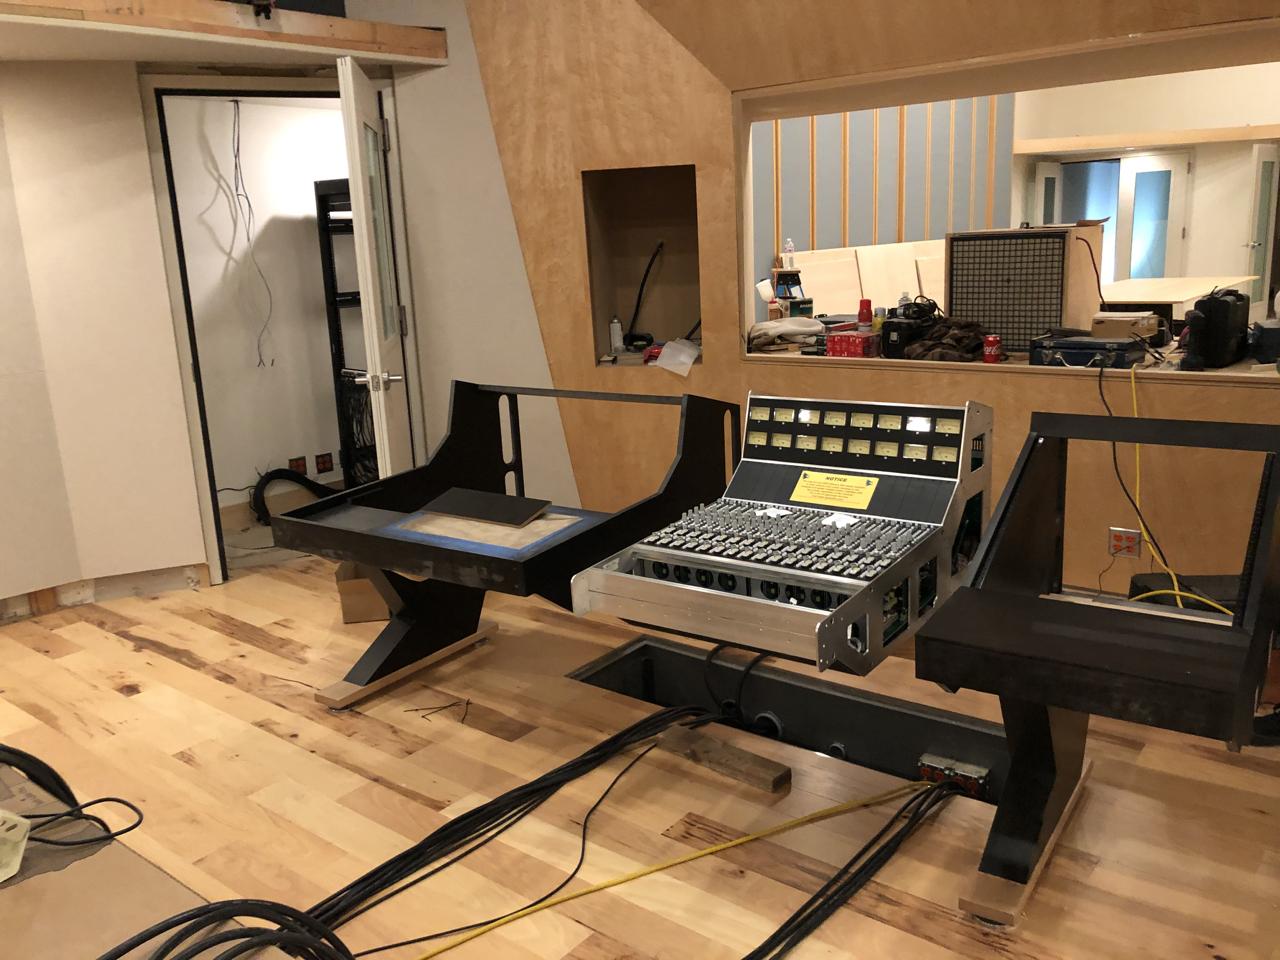 Setting the custom made desk for the 2448.